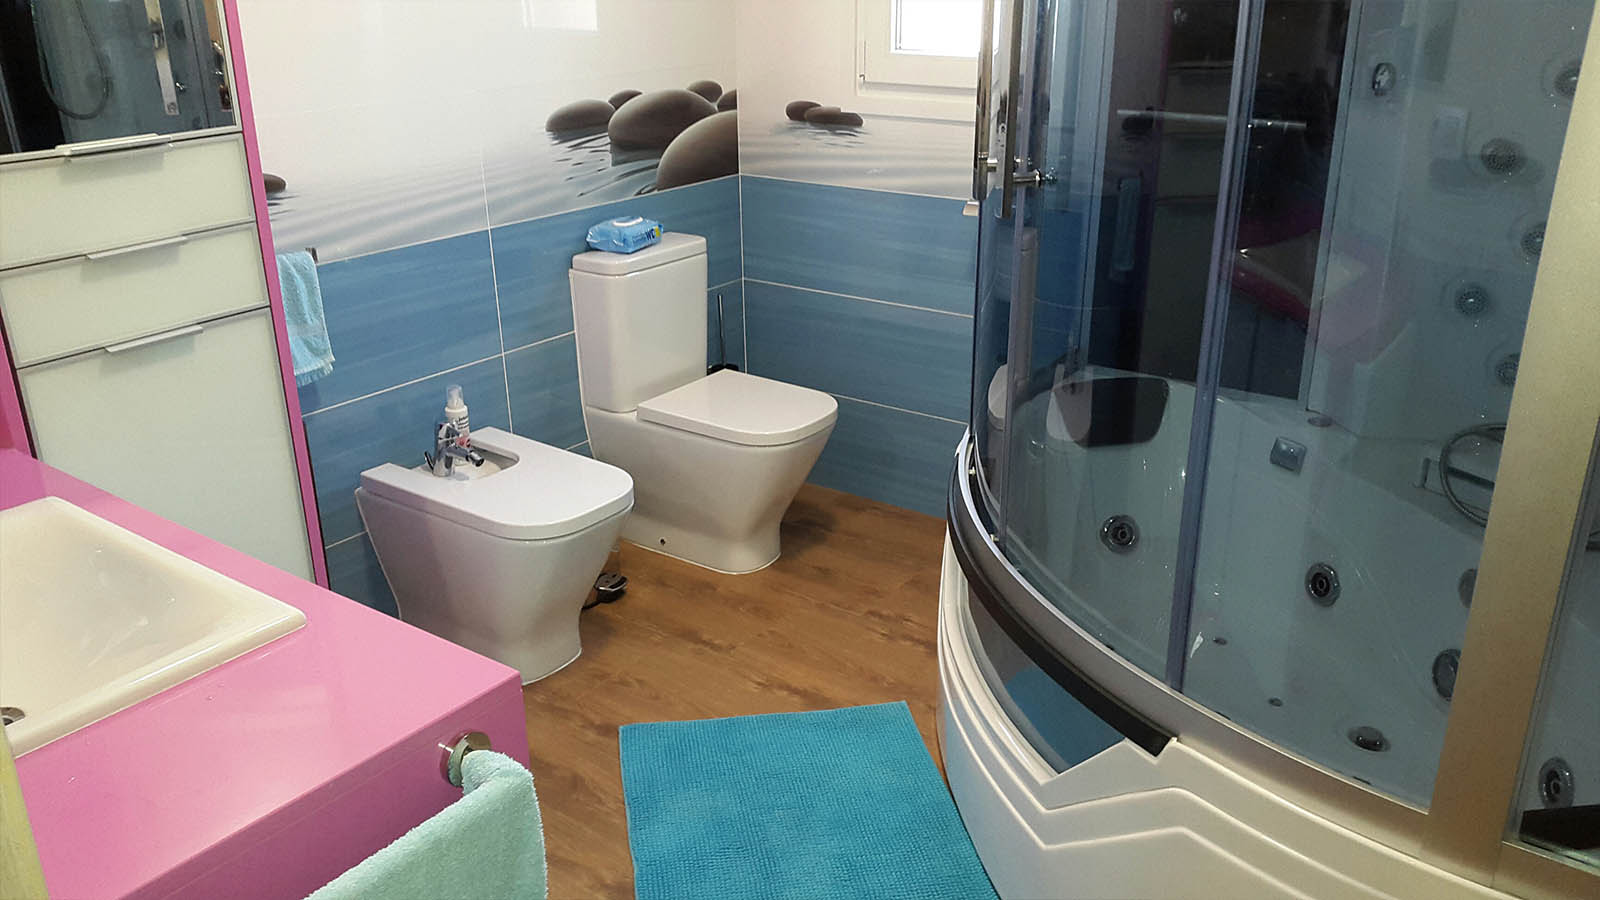 Cabina de hidromasaje bañera AT-012A